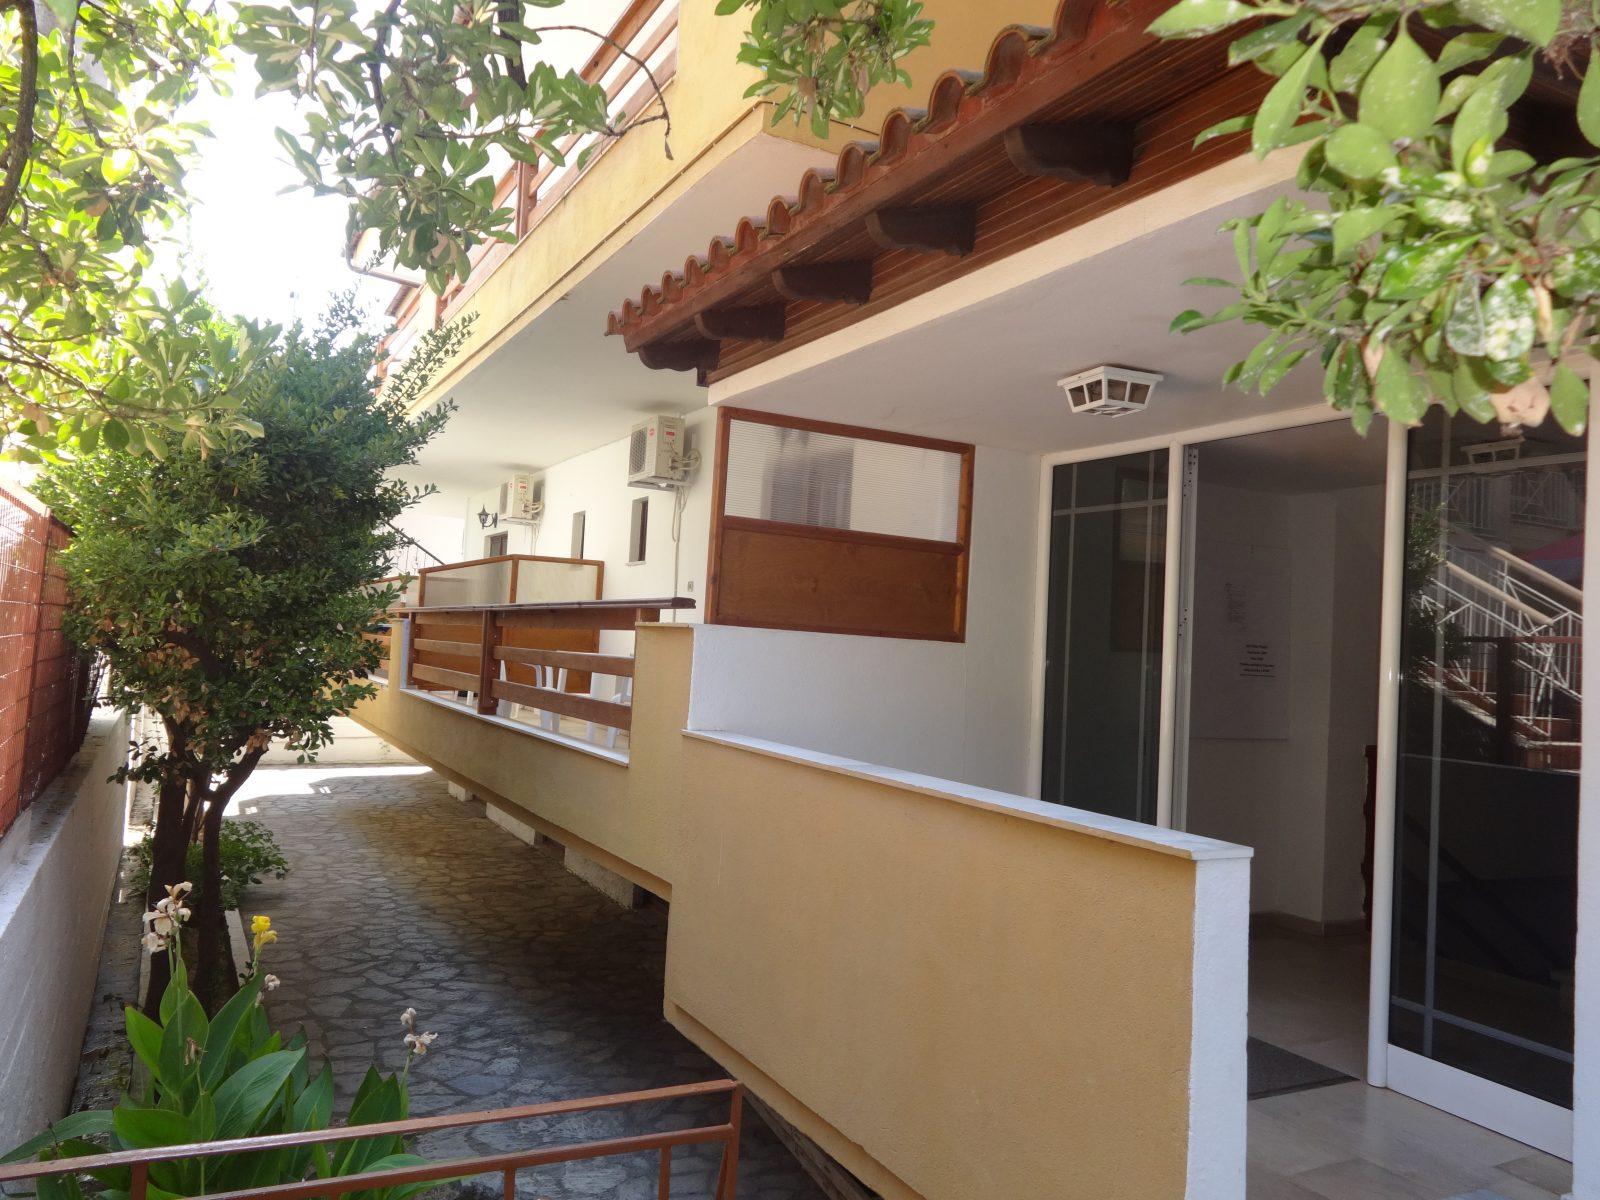 Grcka apartmani letovanje, Nea Flogita Halkidiki, Pirgioti, terase